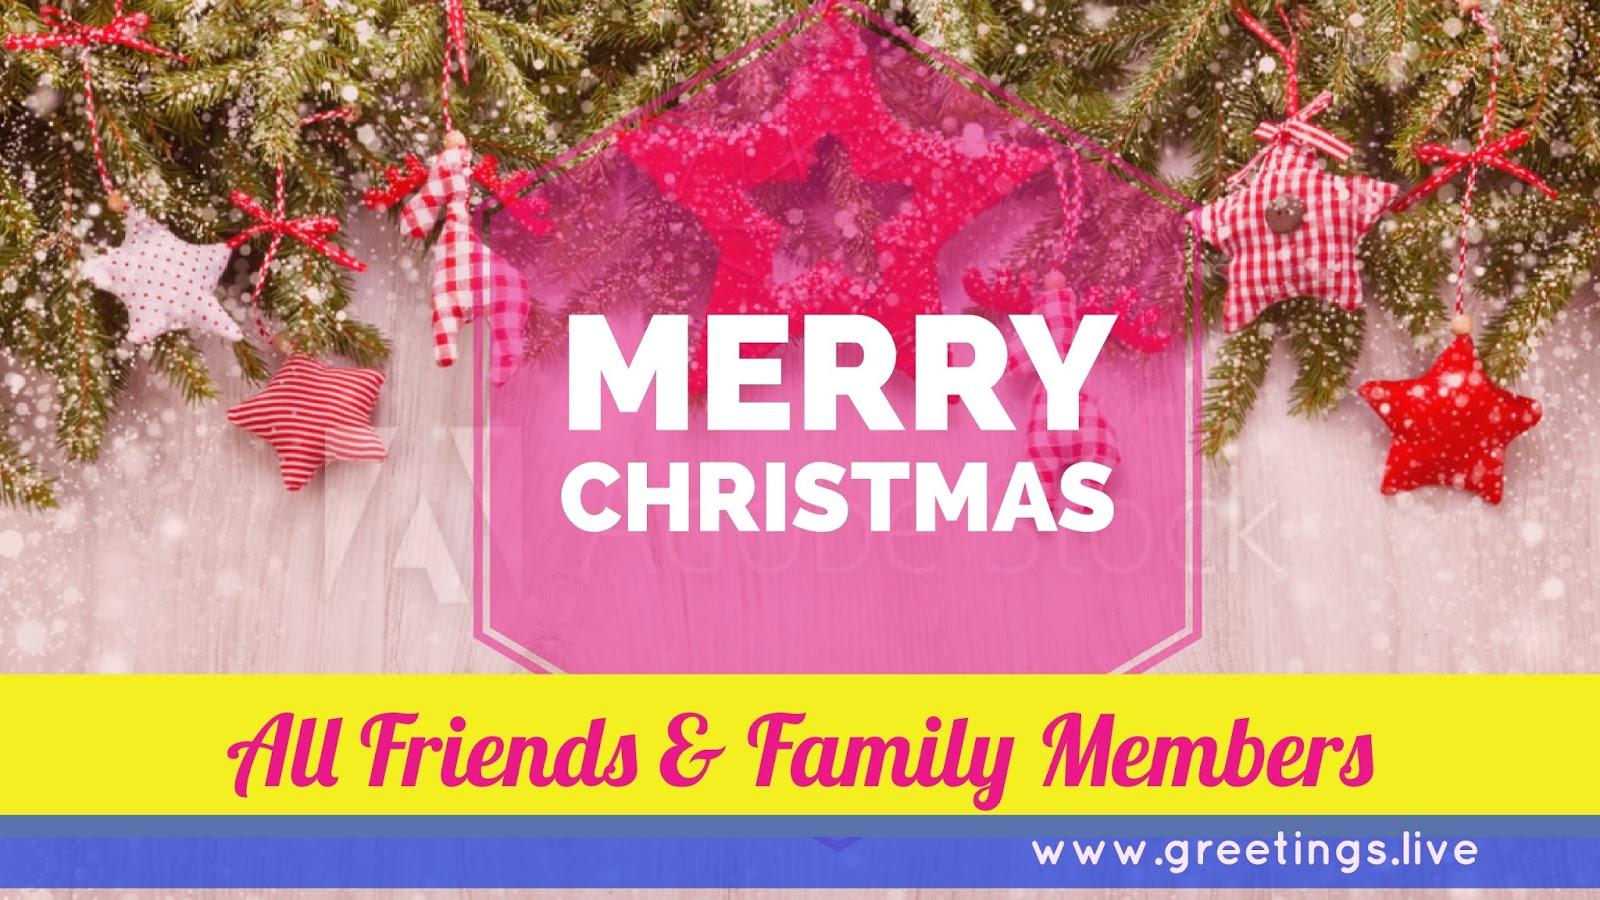 2018 new year wishes greetings christmas star greetings in english christmas star greetings in english language m4hsunfo